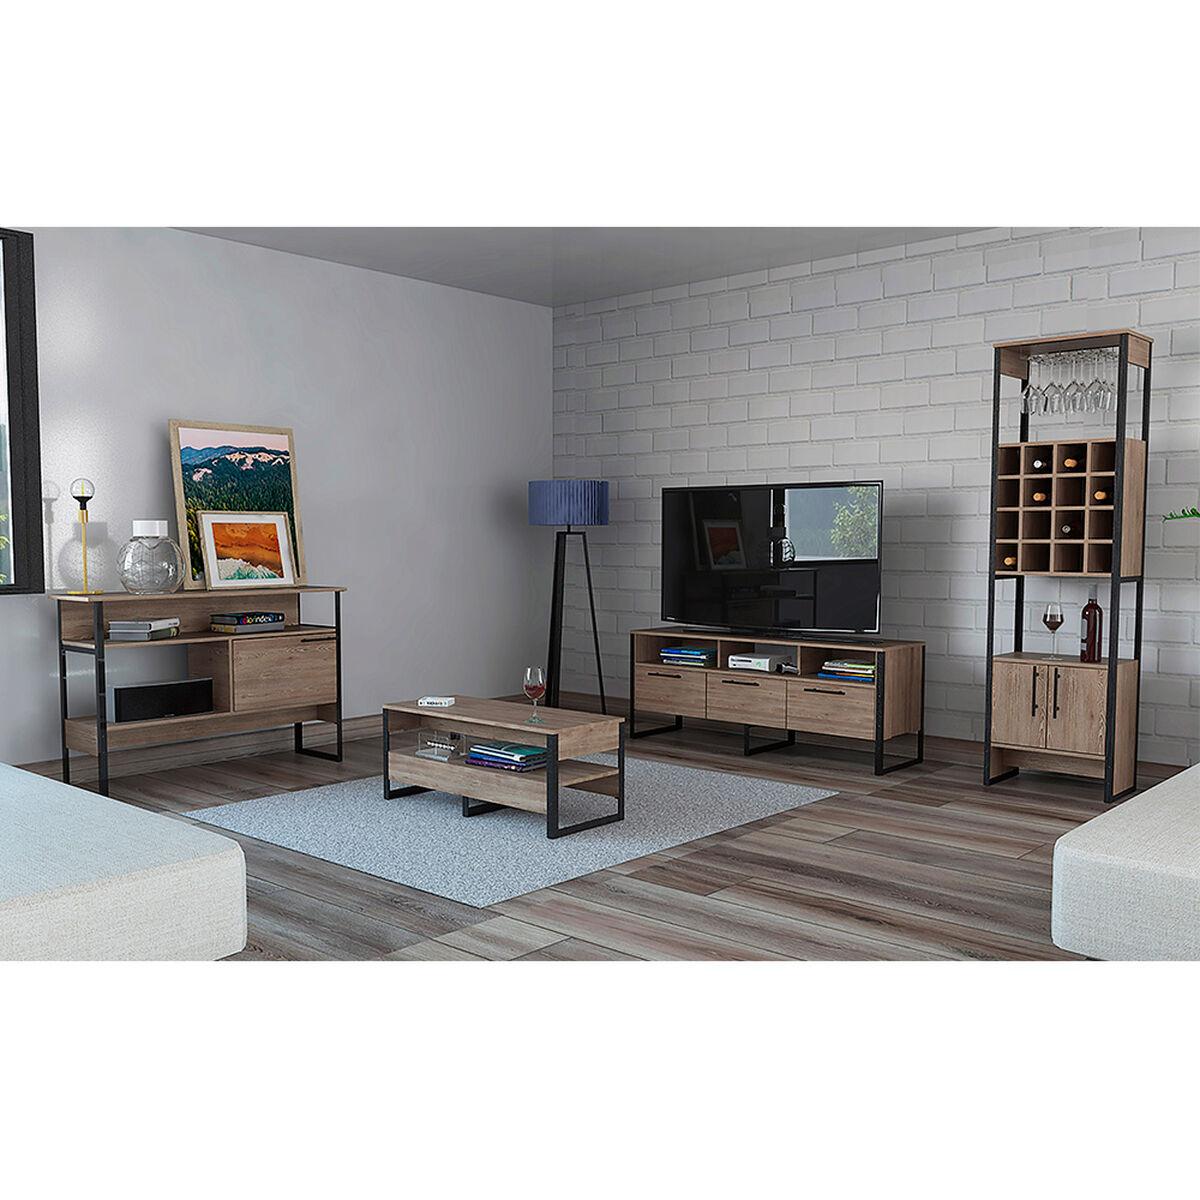 "Rack Tv 60"" + Bar + Arrimo + Mesa Centro Magnum"